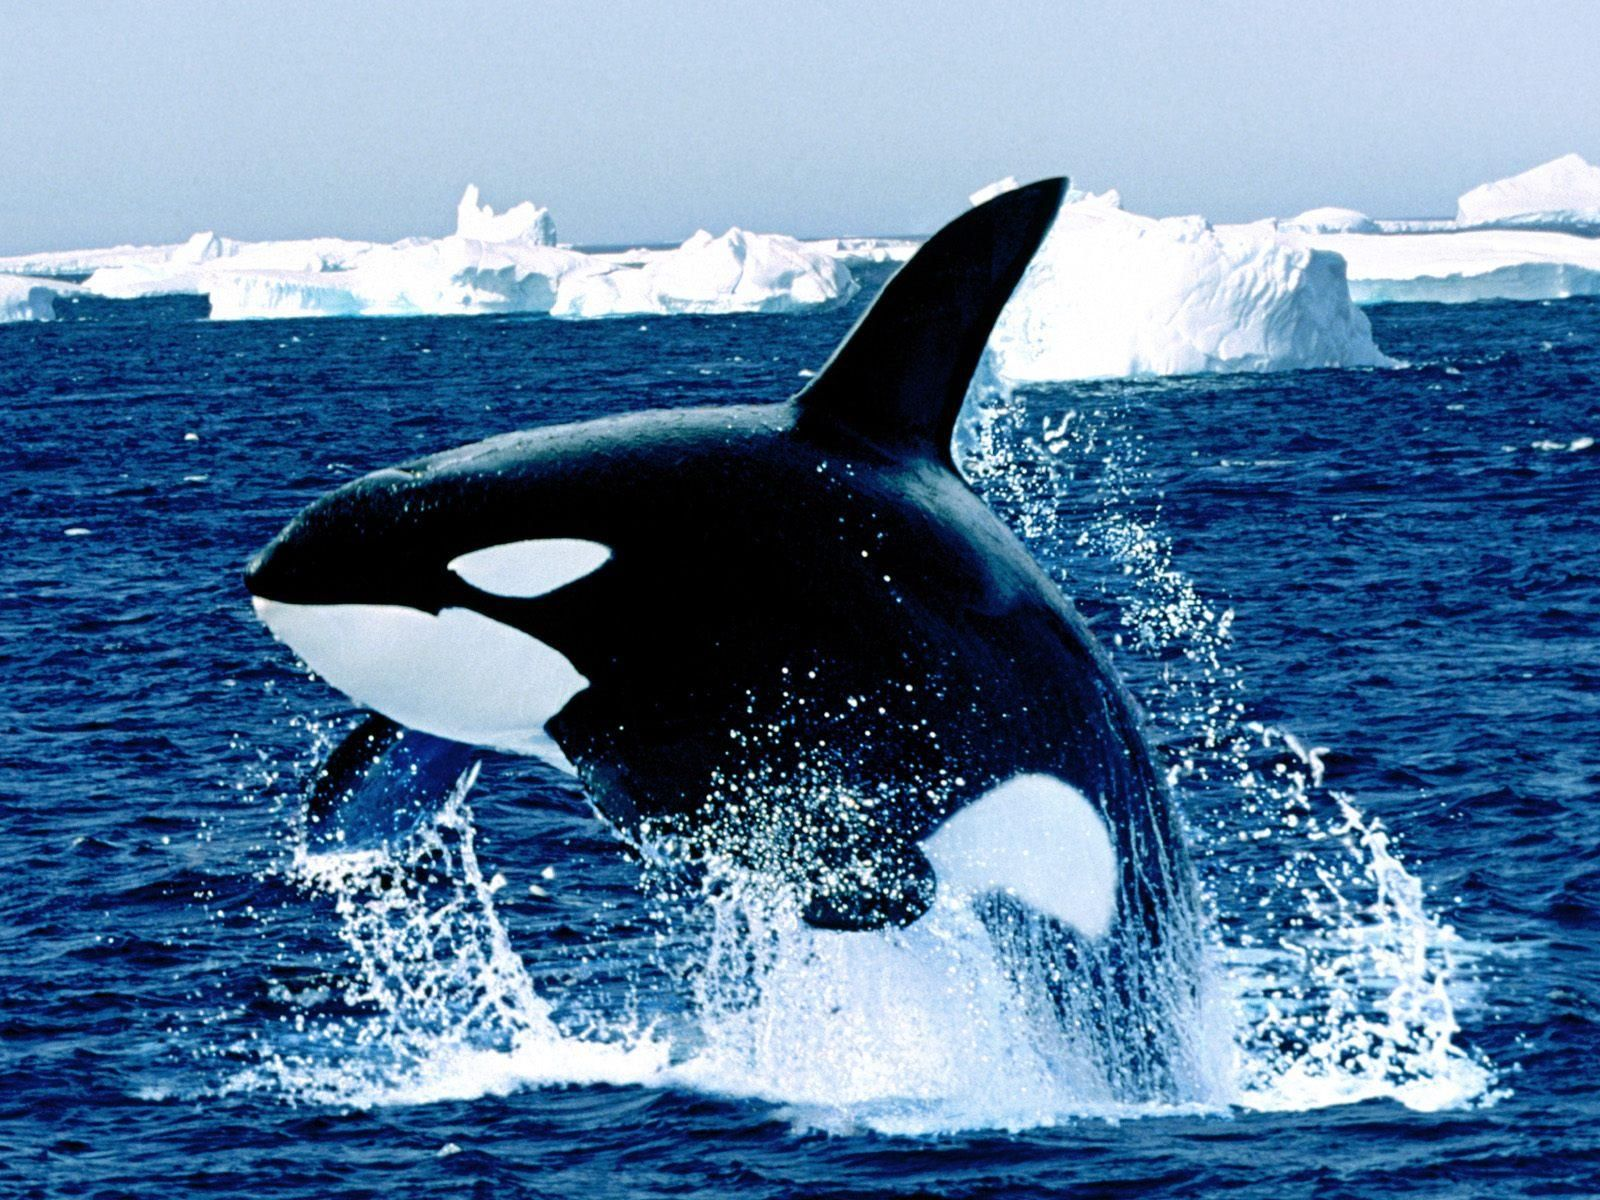 Orca Hd Wallpaper Jpg 1600 1200 シャチ オルカ クジラ